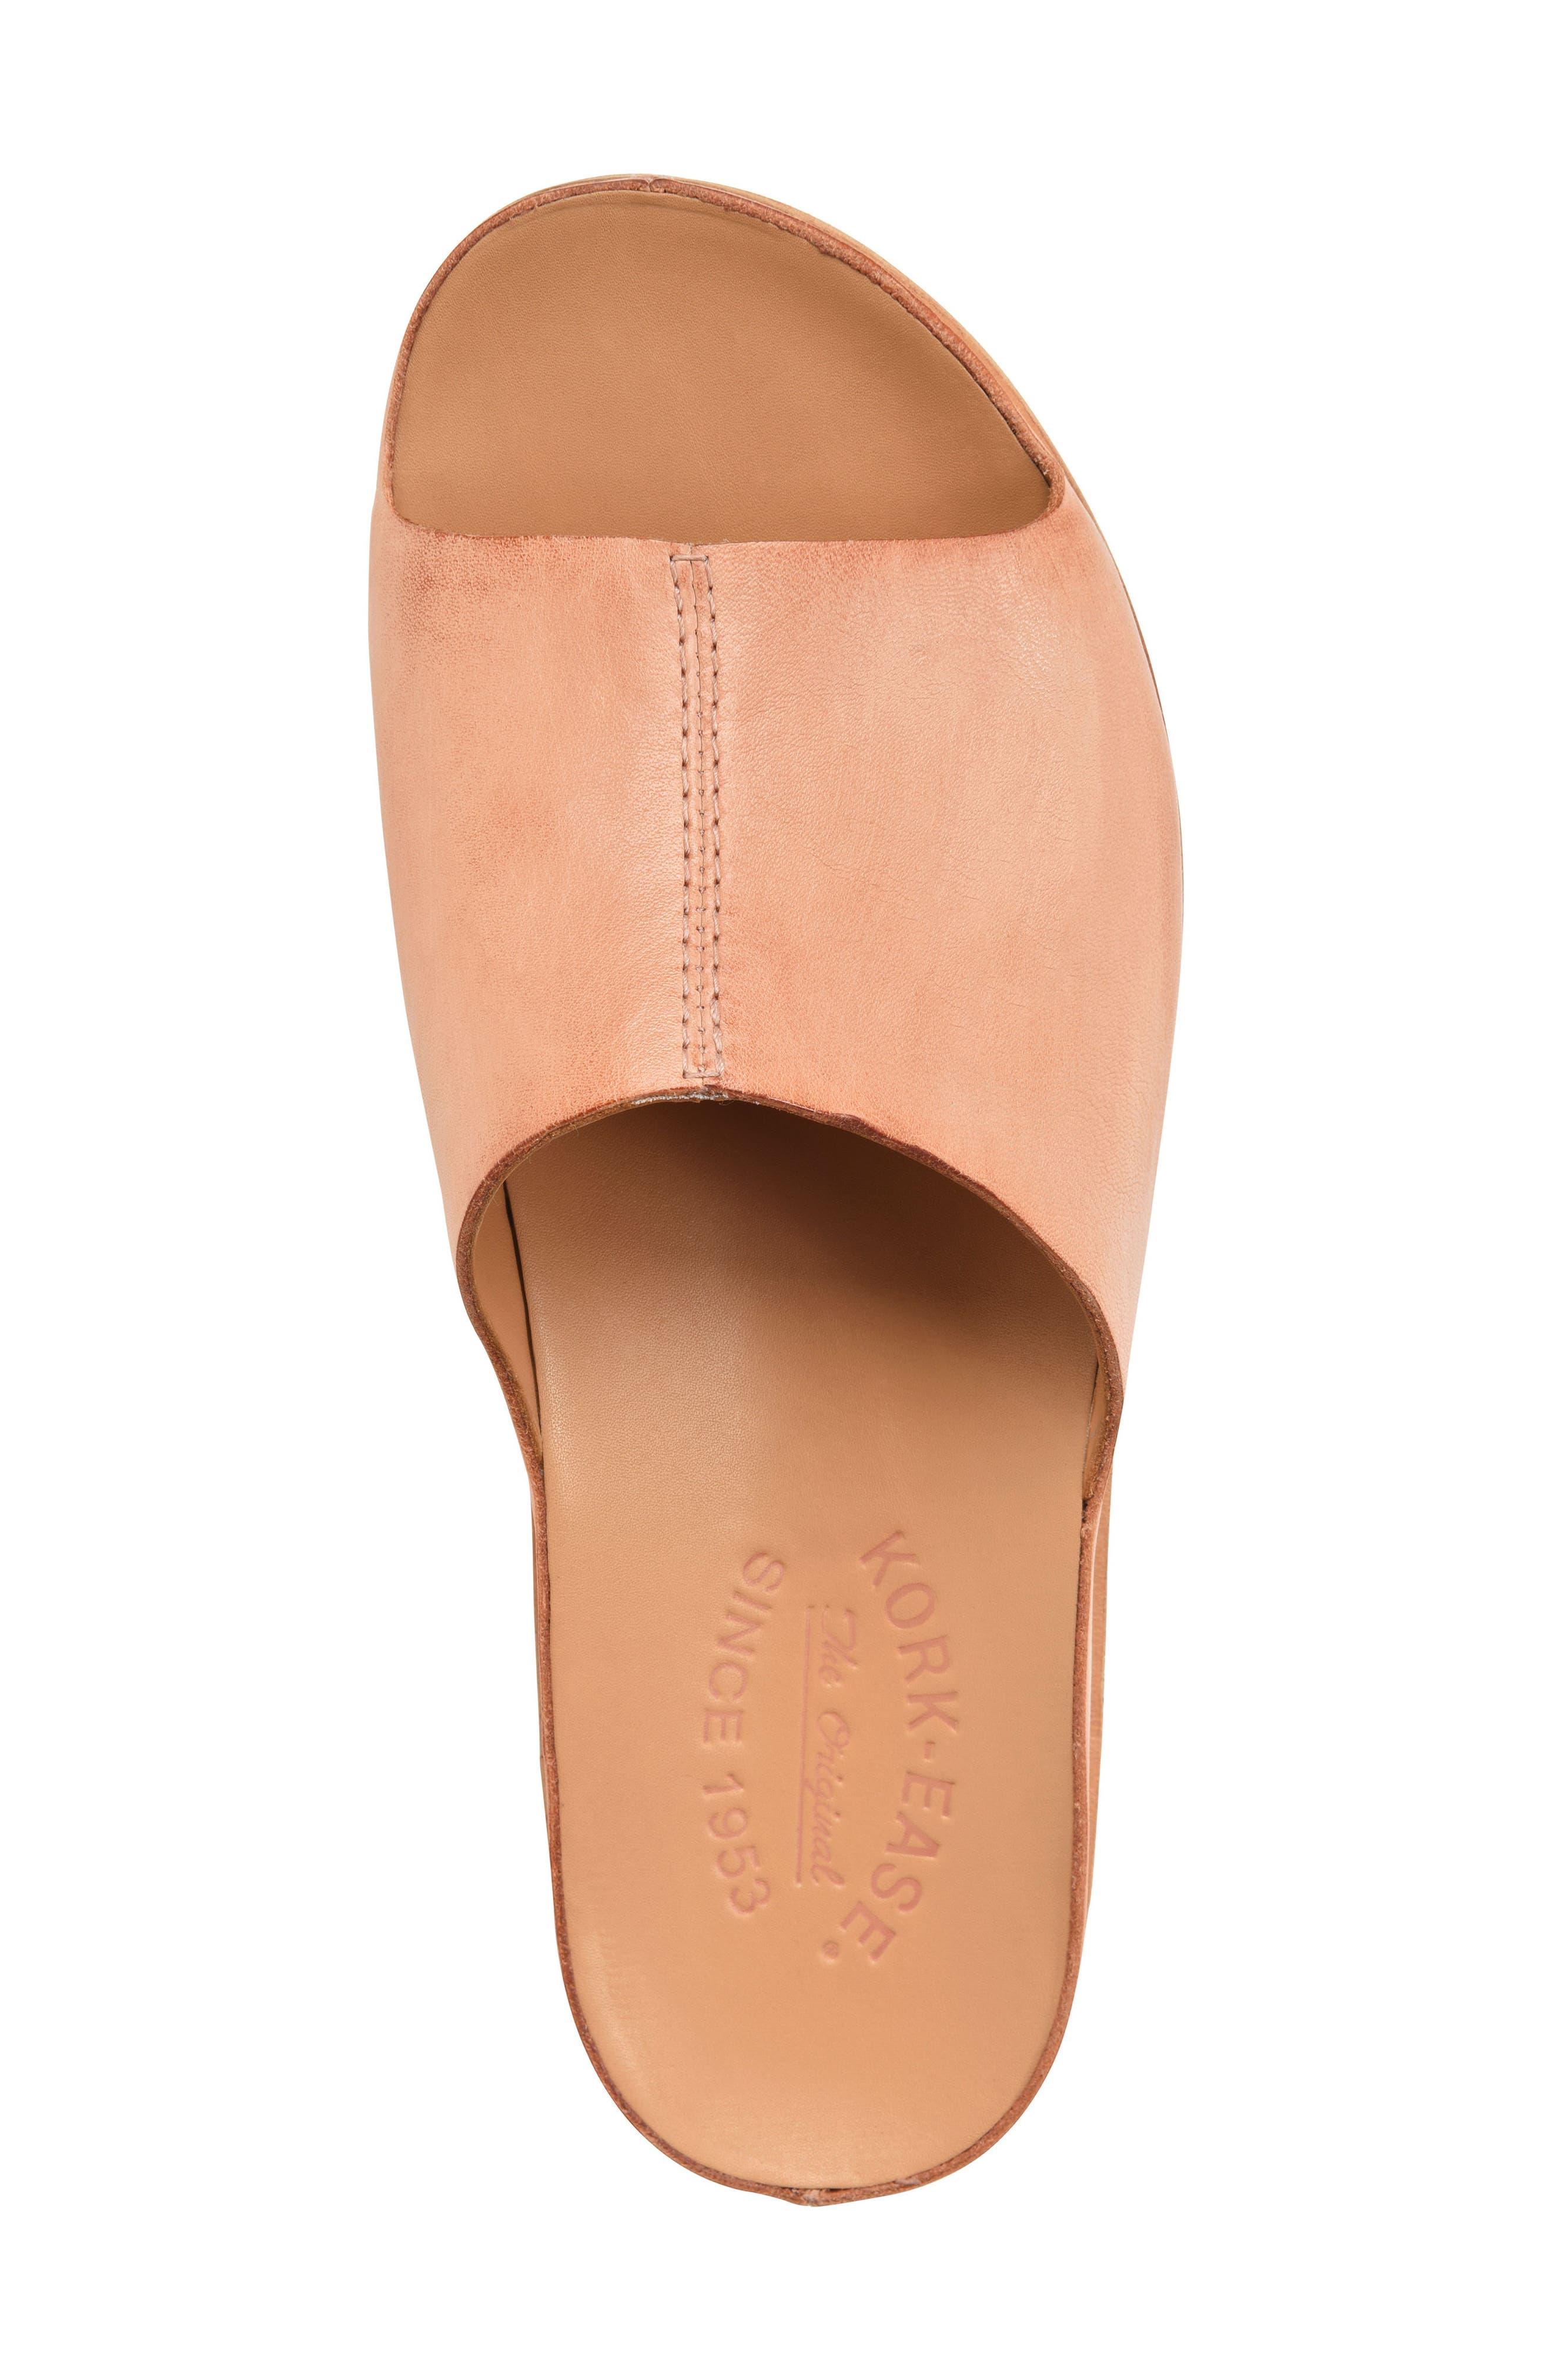 'Tutsi' Slide Sandal,                             Alternate thumbnail 5, color,                             Blush Leather